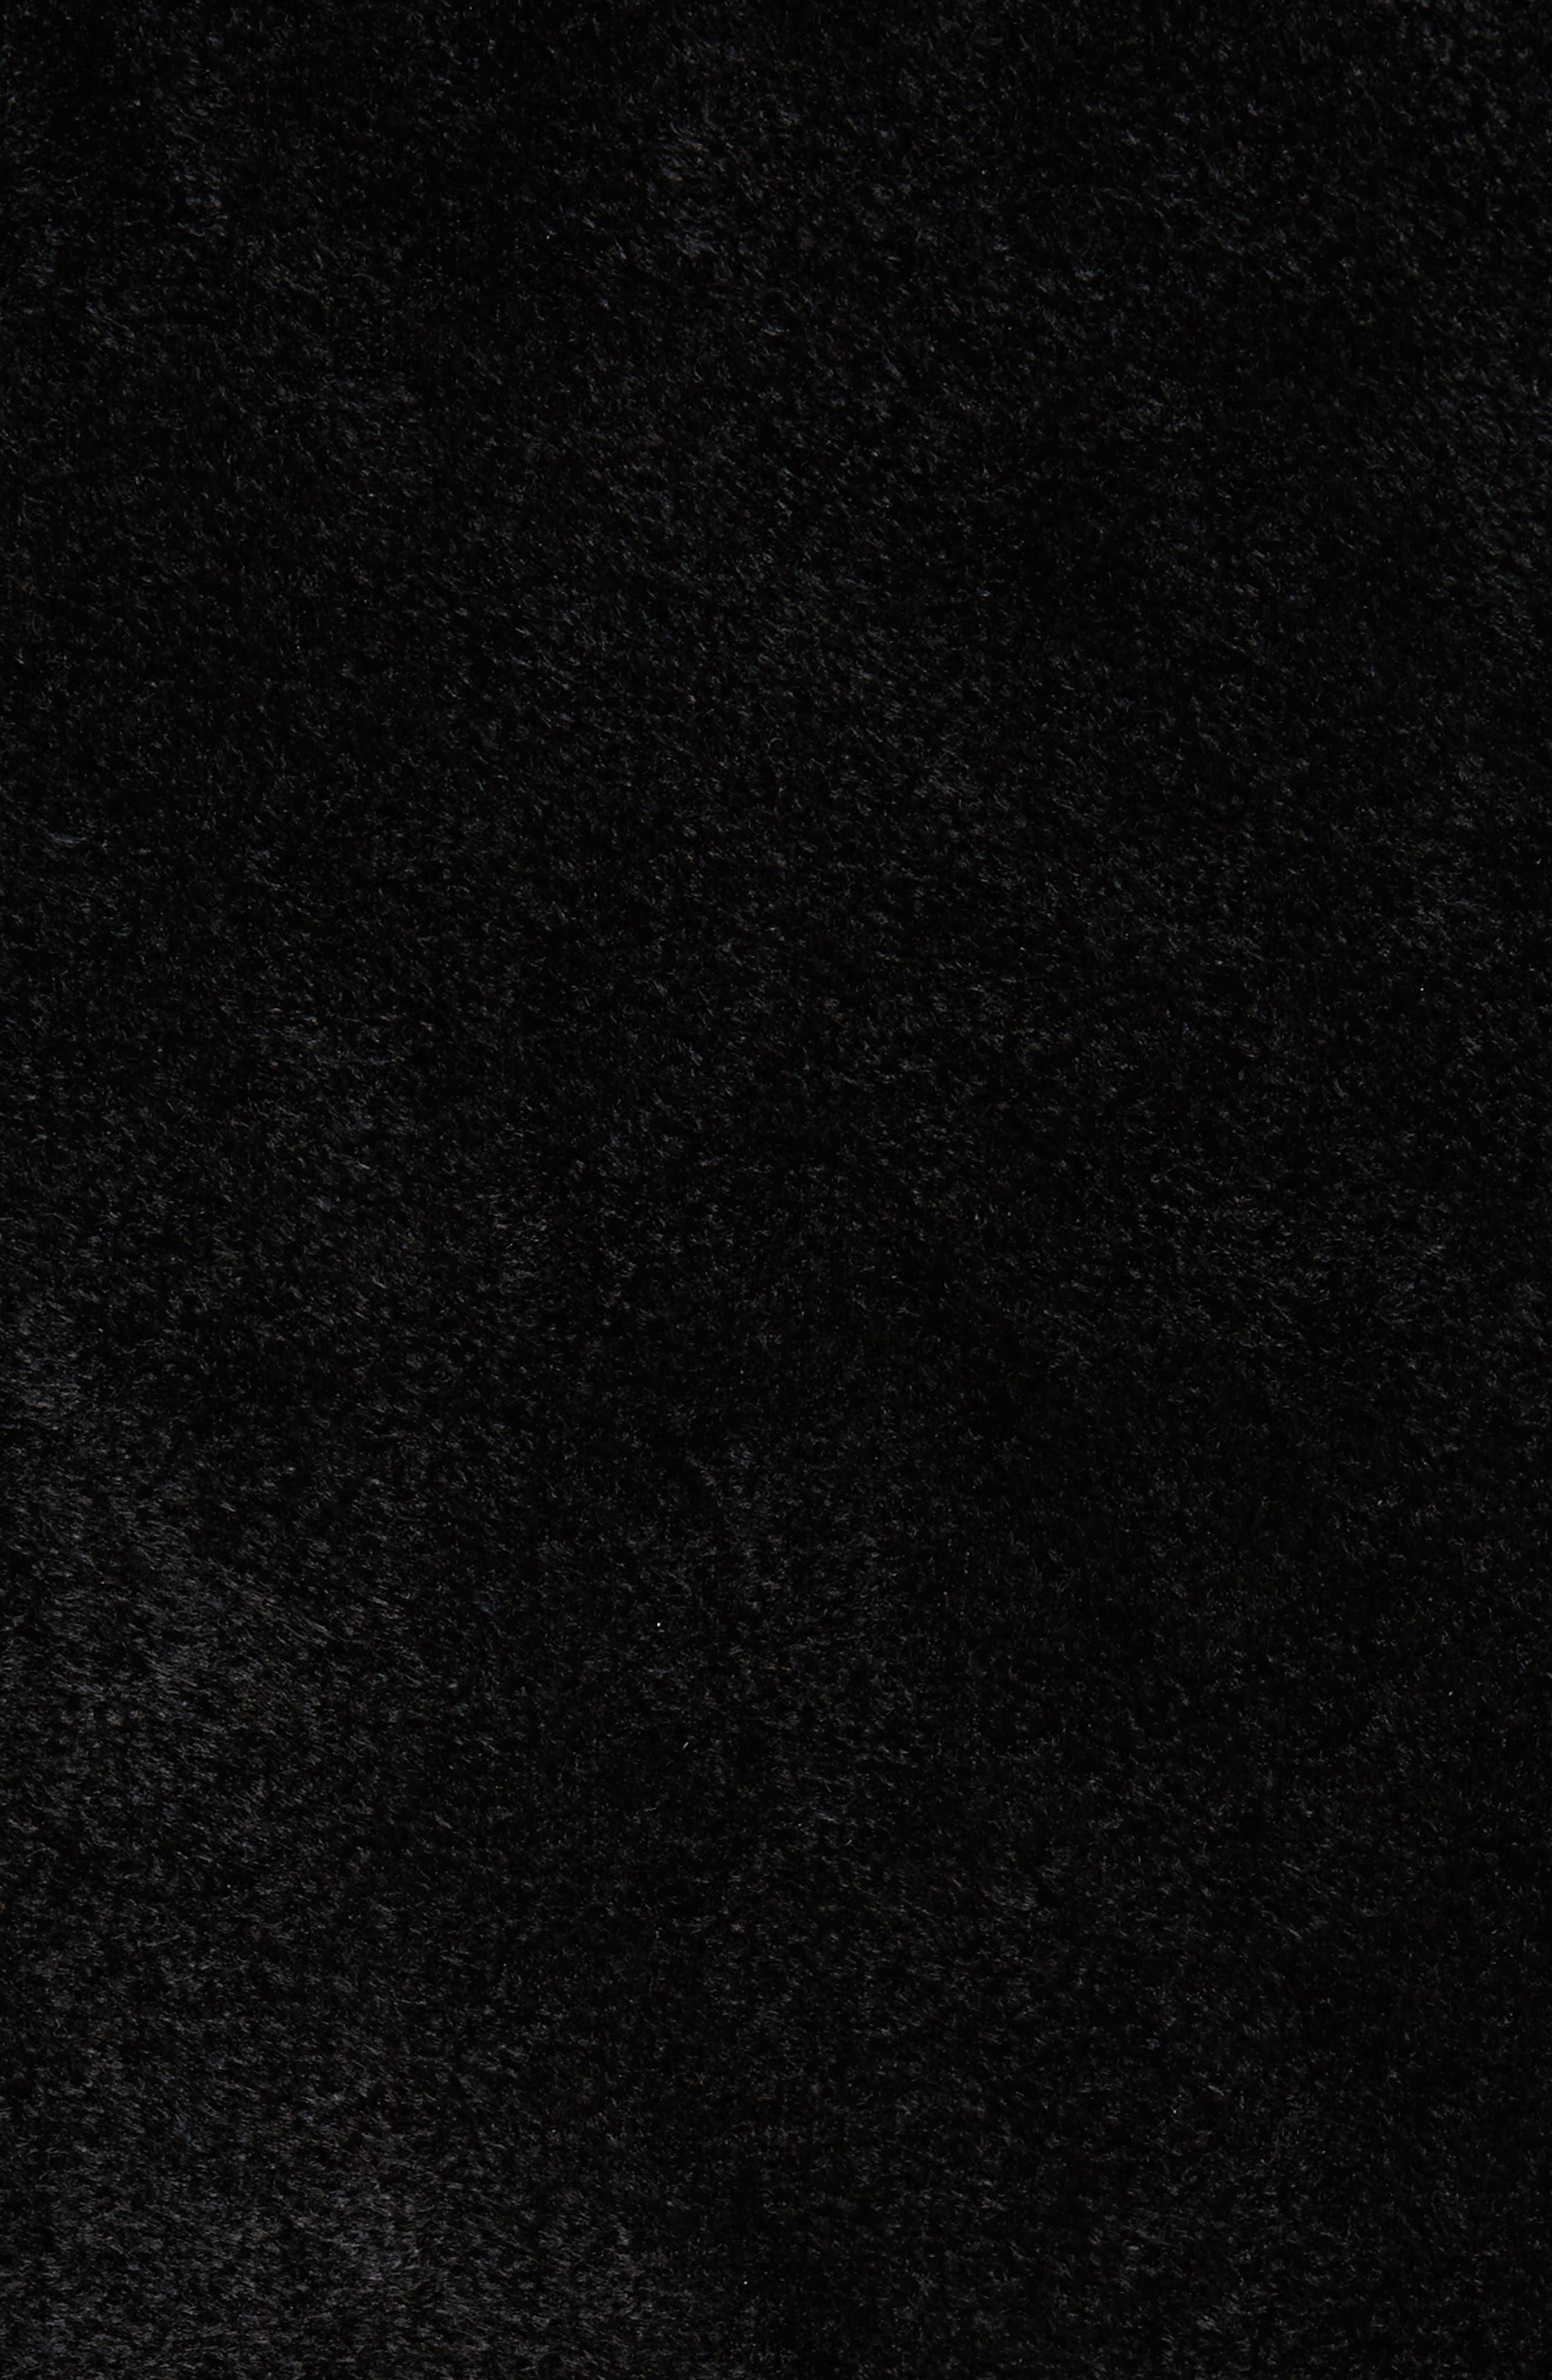 Chenille Turtleneck Sweater,                             Alternate thumbnail 5, color,                             00N99 Black